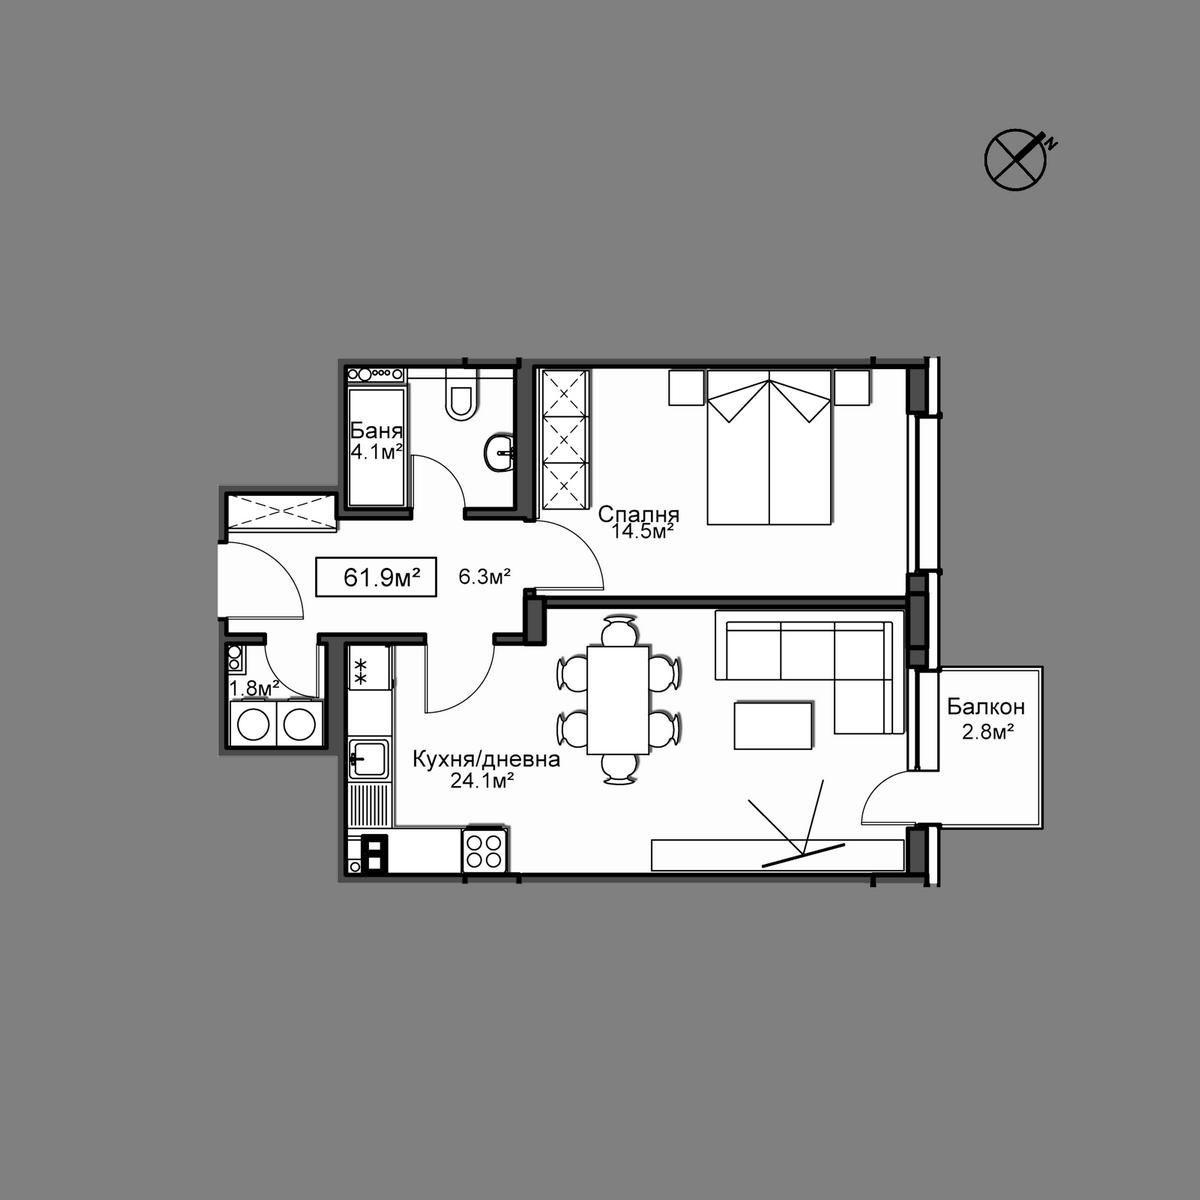 Продава апартамент ново строителство - Апартамент 35